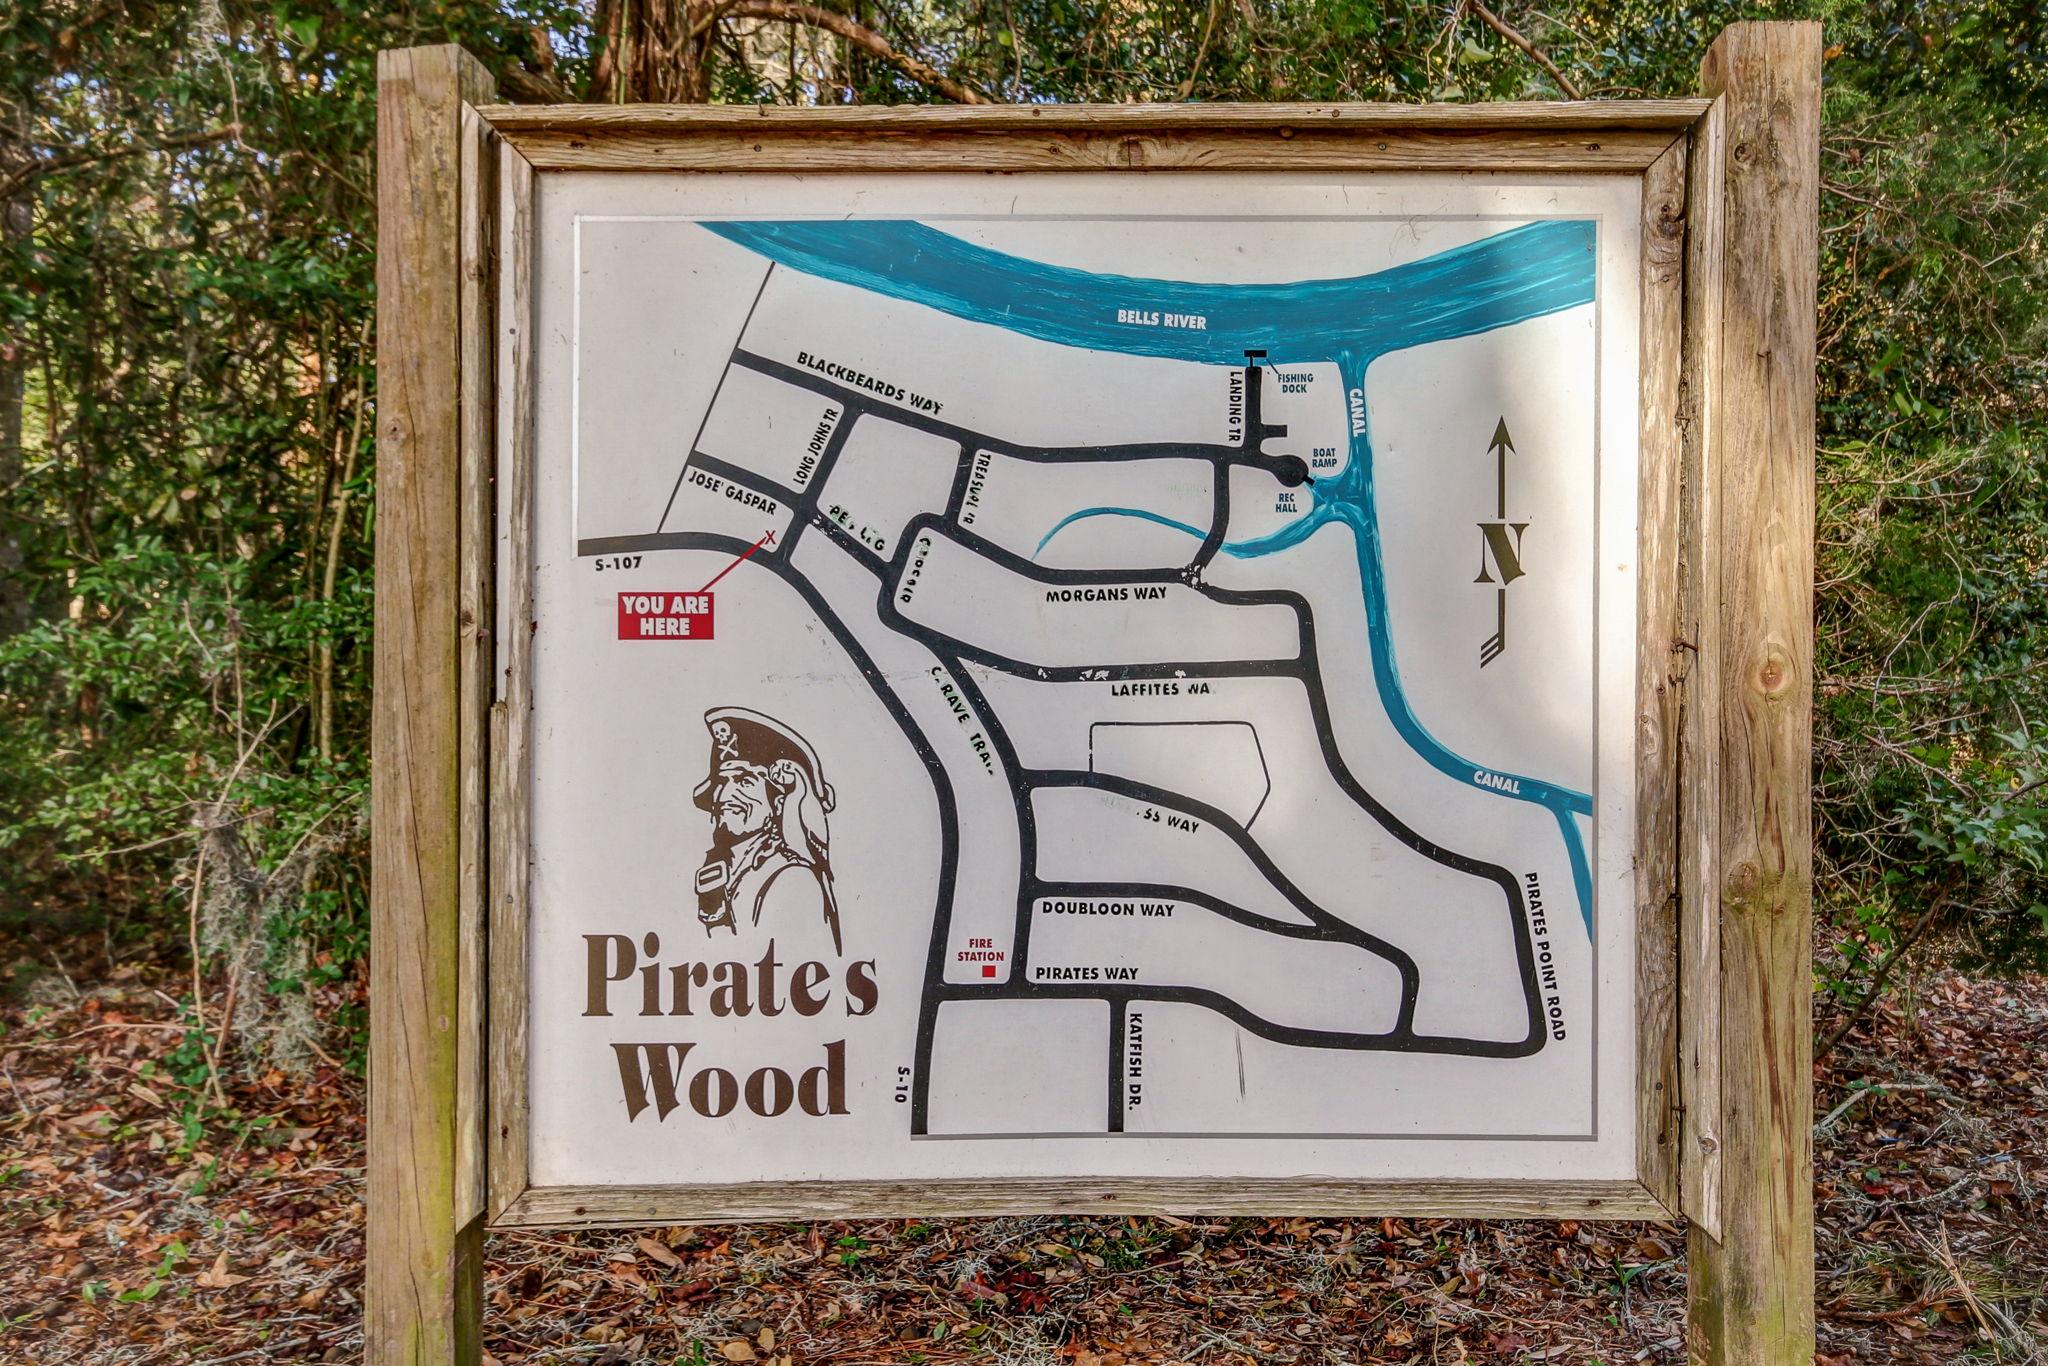 Pirate's Wood